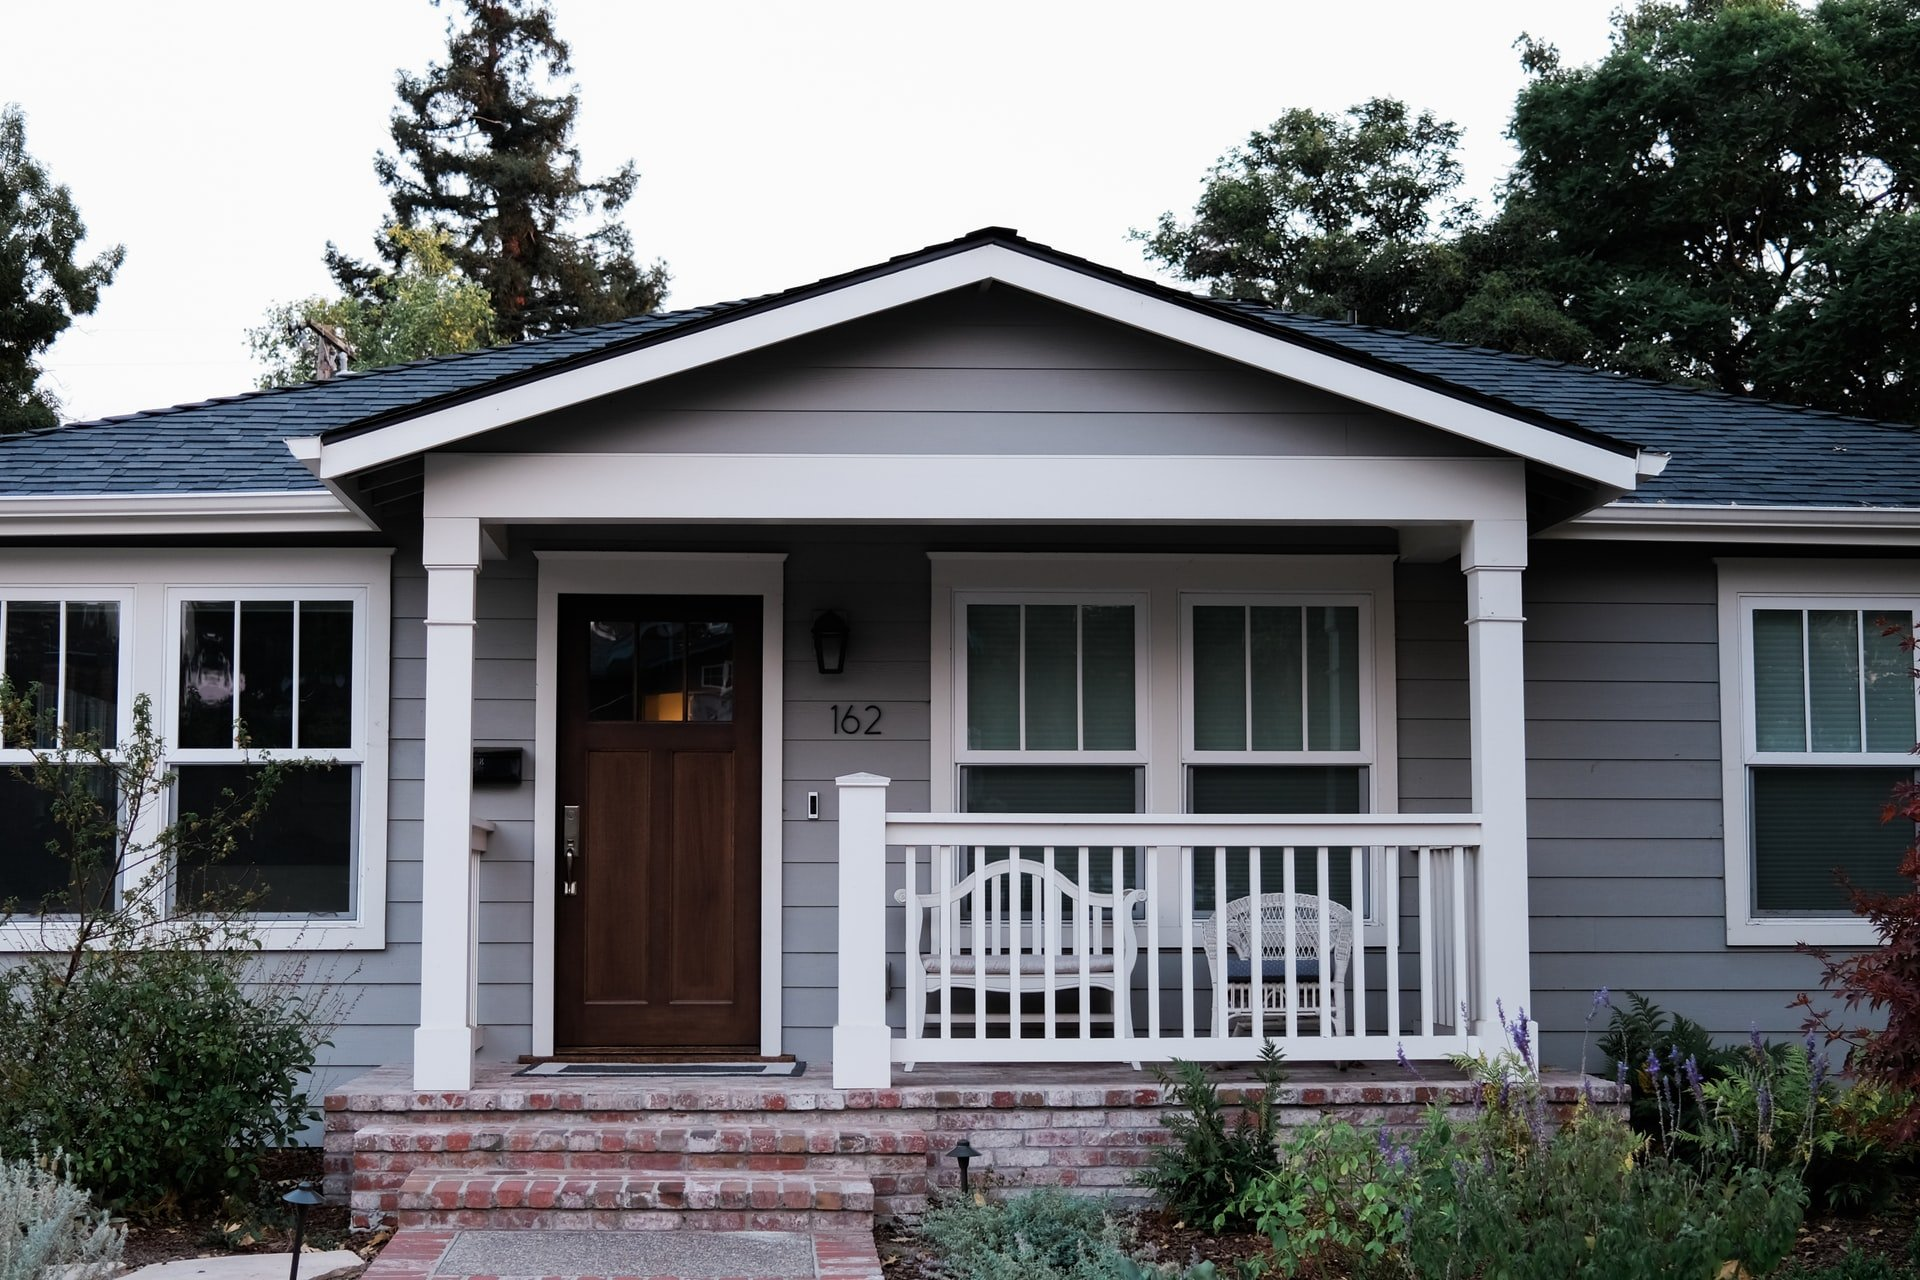 Detrazioni Assicurazione Casa